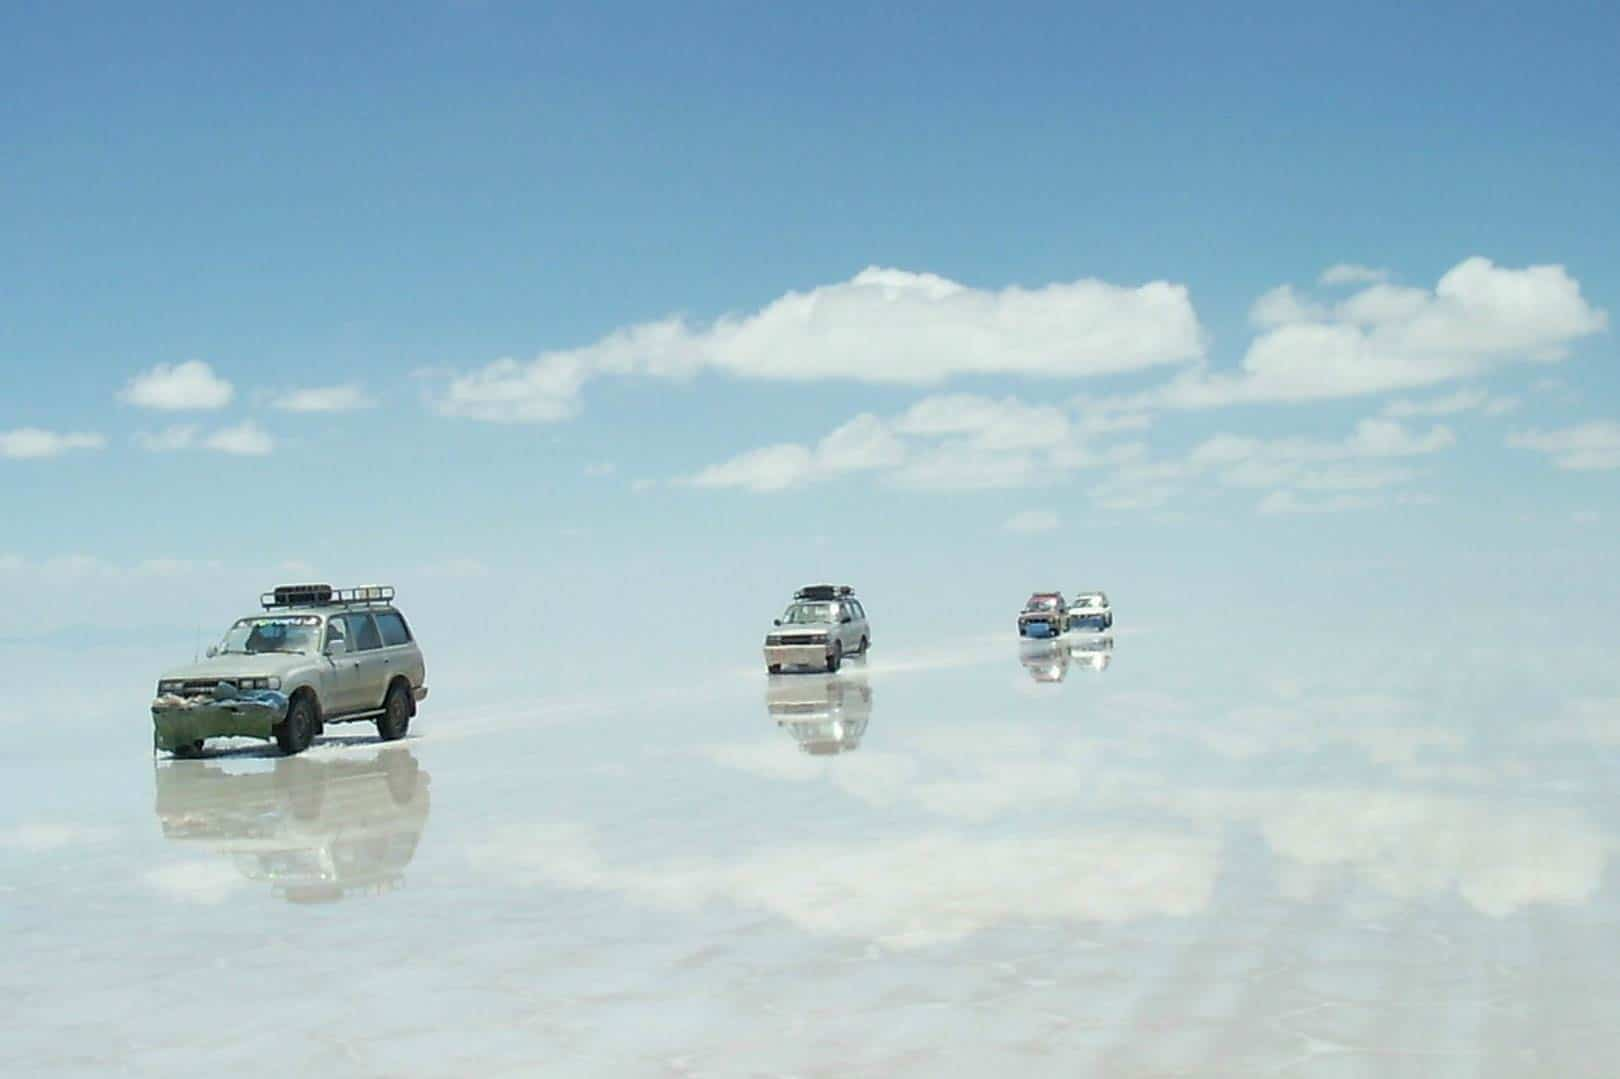 Turiști explorând zona inundată